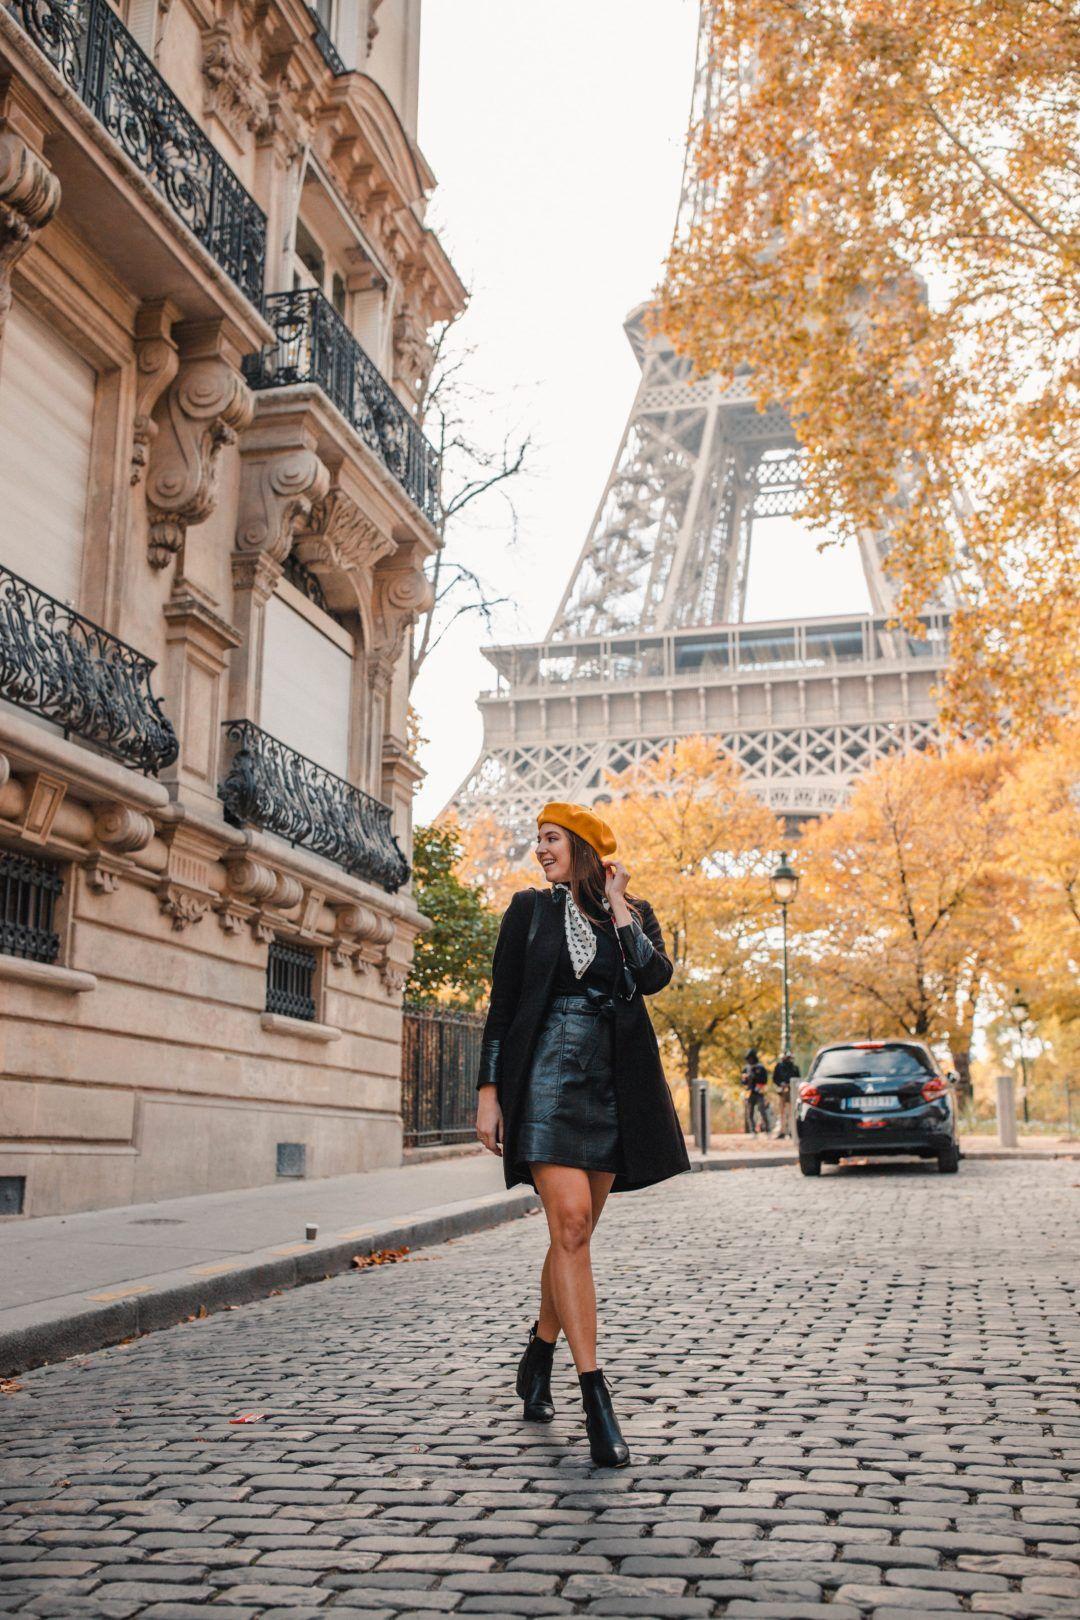 6 Secret Places to View the Eiffel Tower | Eiffel Tower Photo Spots #eiffeltower